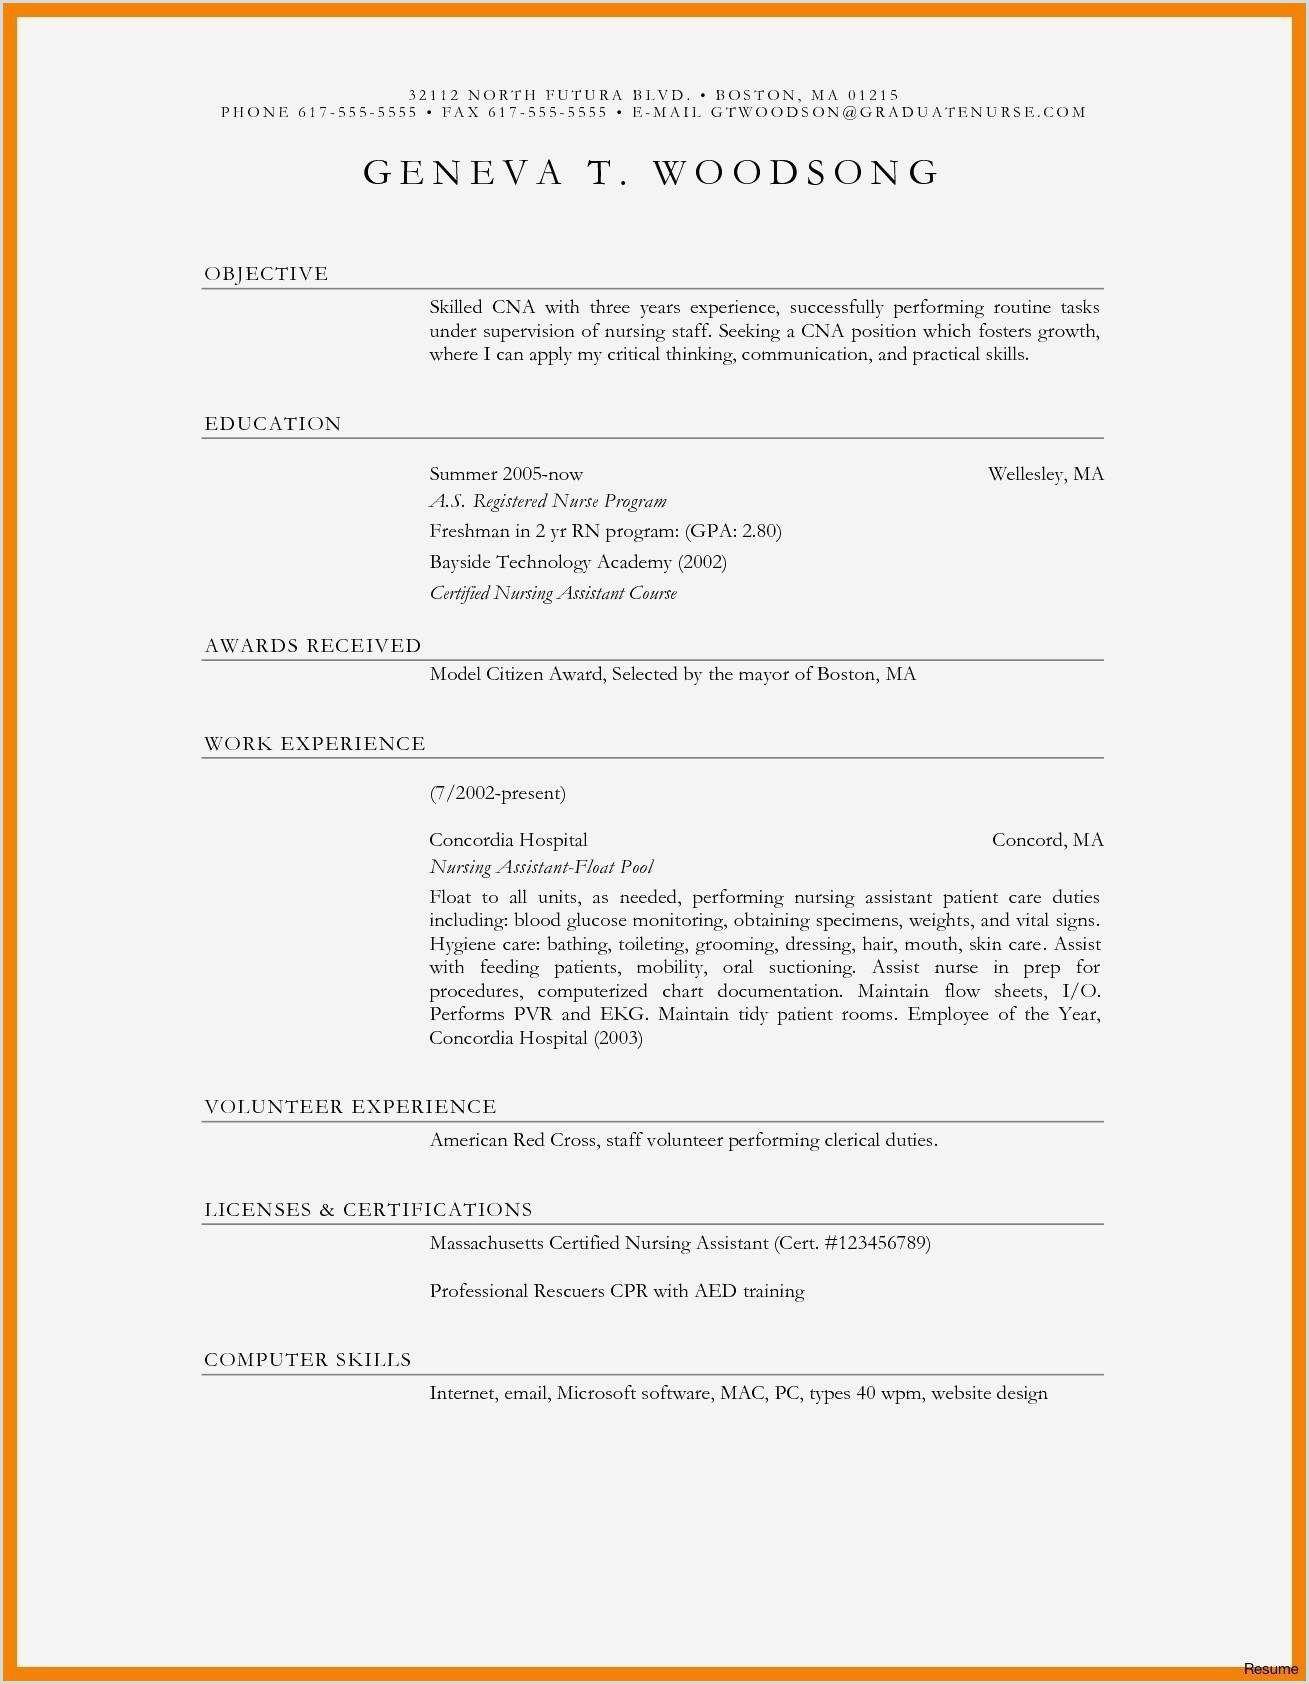 Cv Libre Fice Le Luxe New Blank Resume Format Resume Resume Examples Flight Attendant Resume Teacher Resume